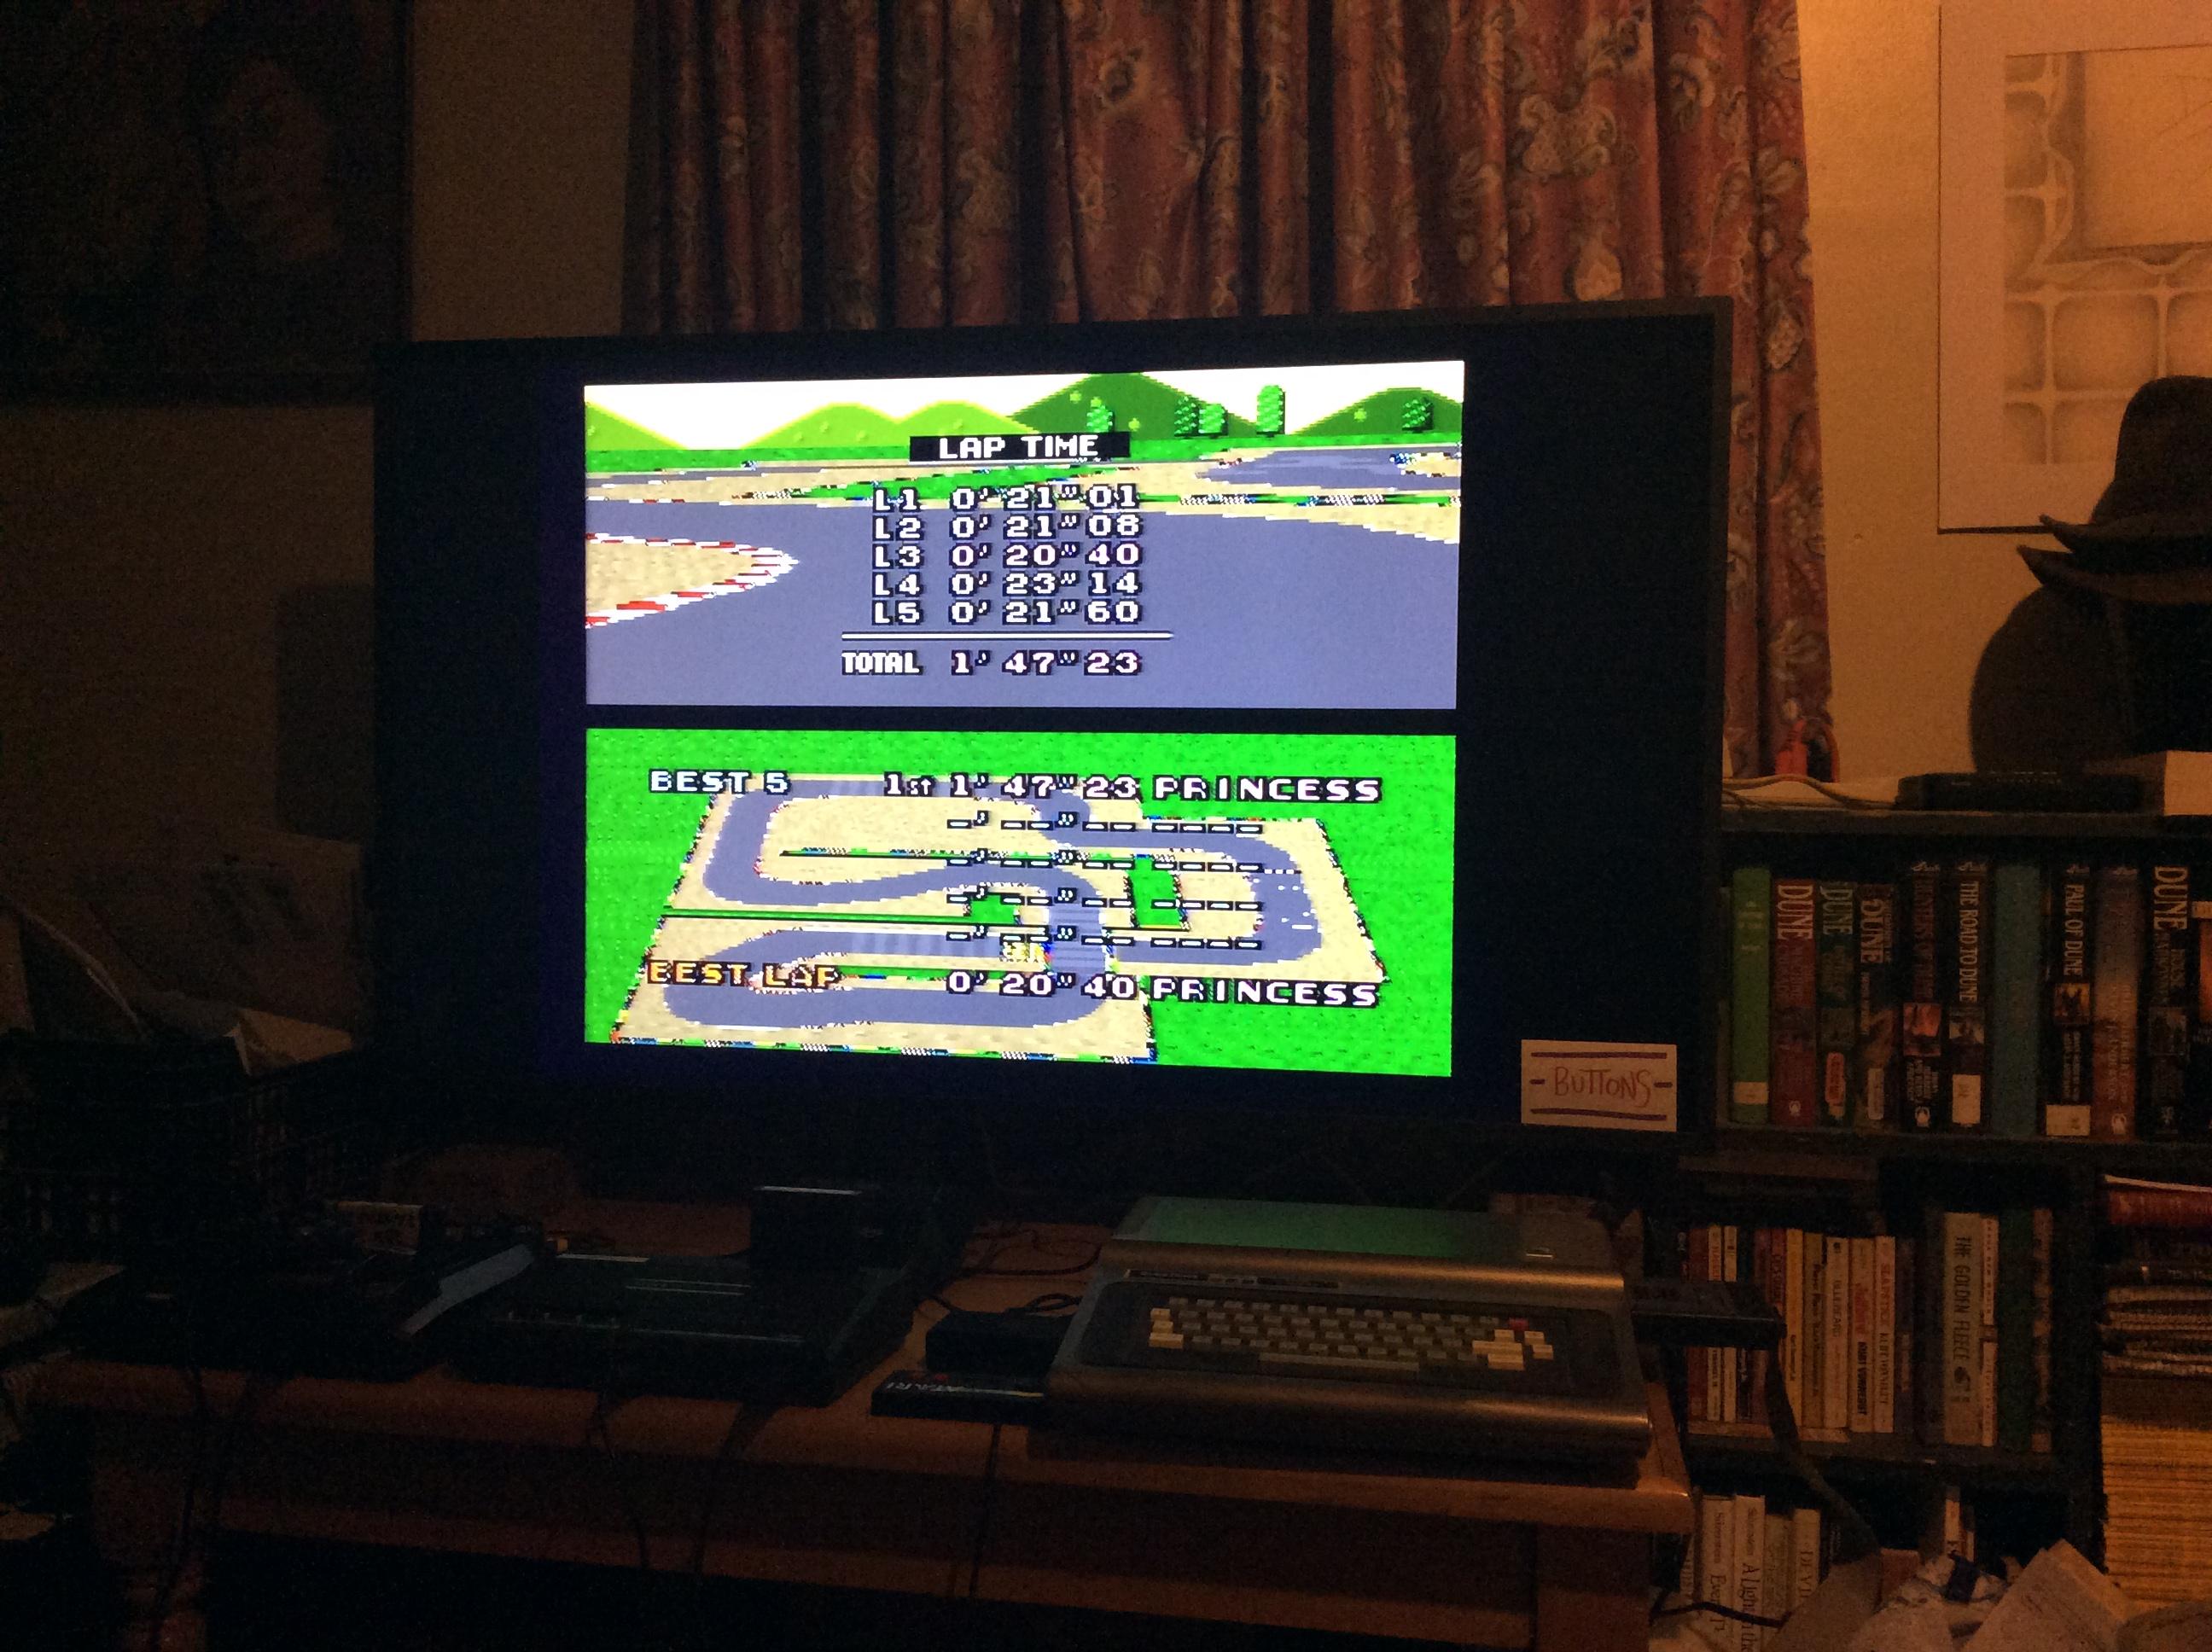 Super Mario Kart: Mario Circuit 2 [Time Trial] [Lap Time] time of 0:00:20.4